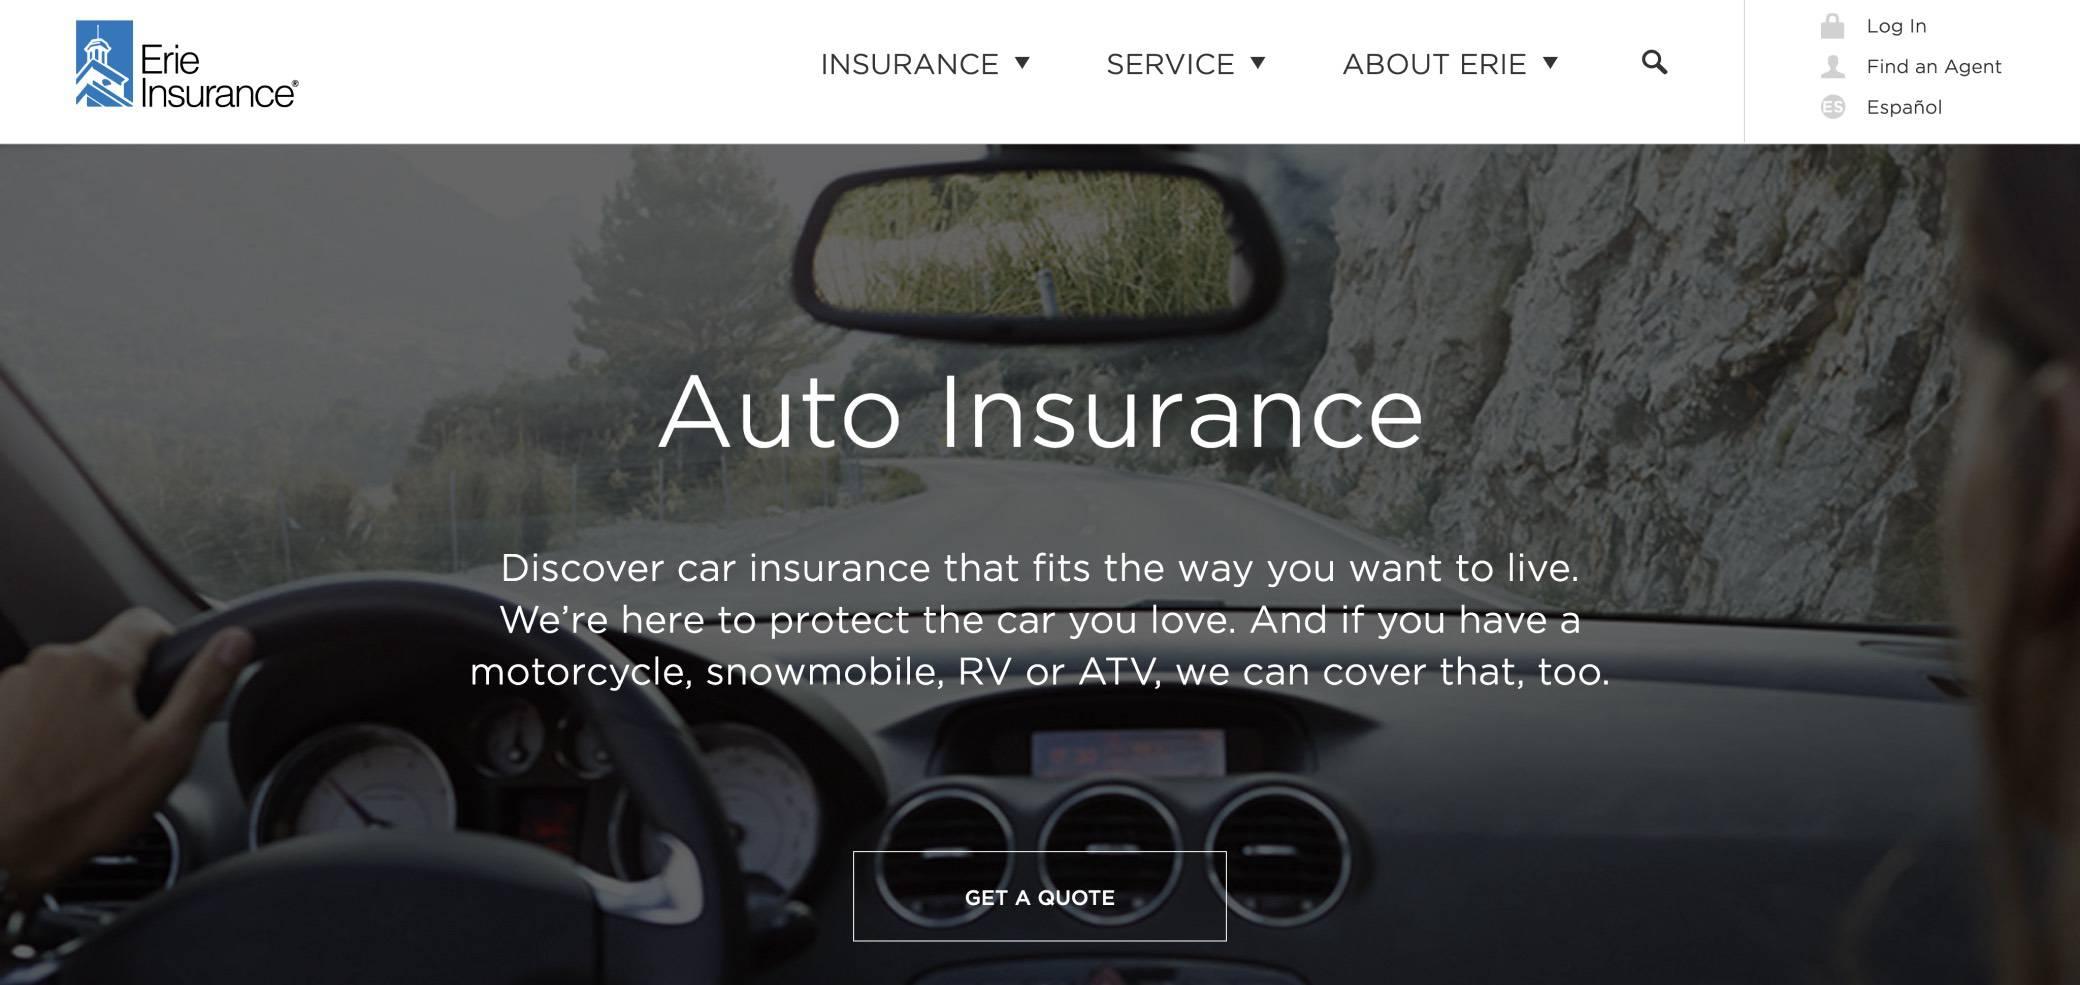 erie-insurance image